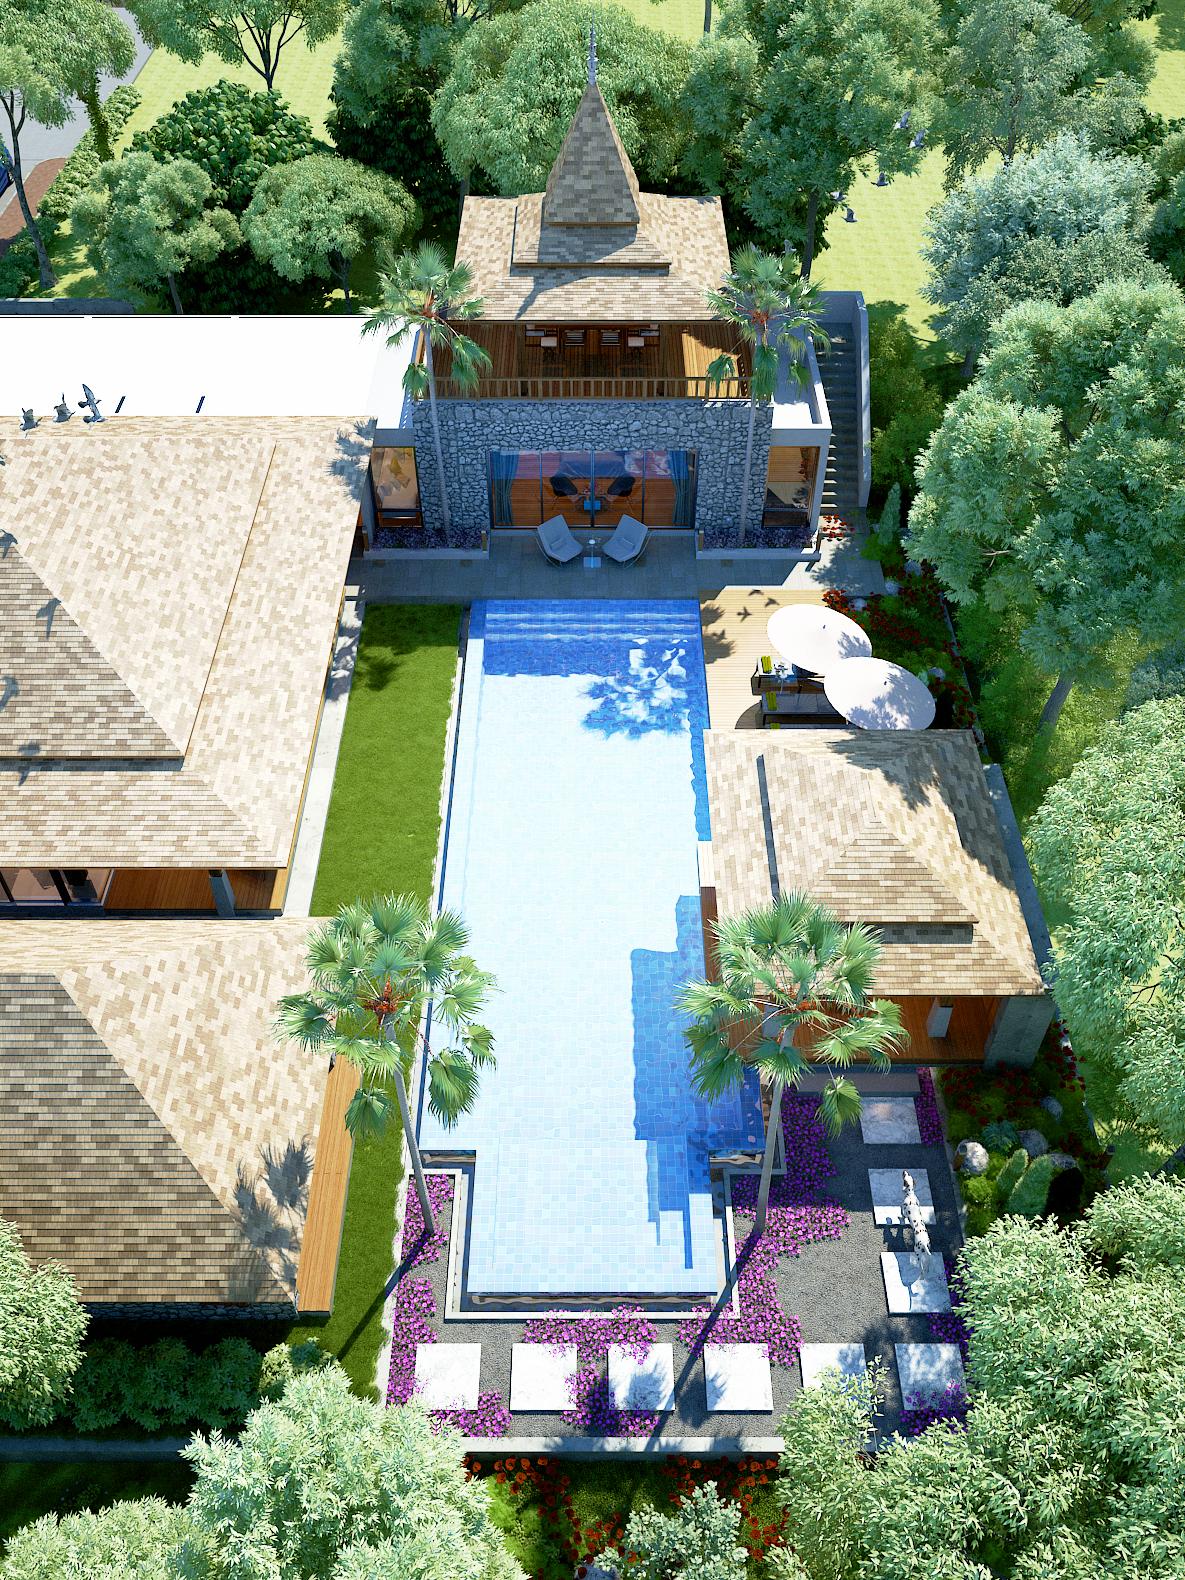 Luxury balinese villas in Bang Tao Beach - SkyProperty